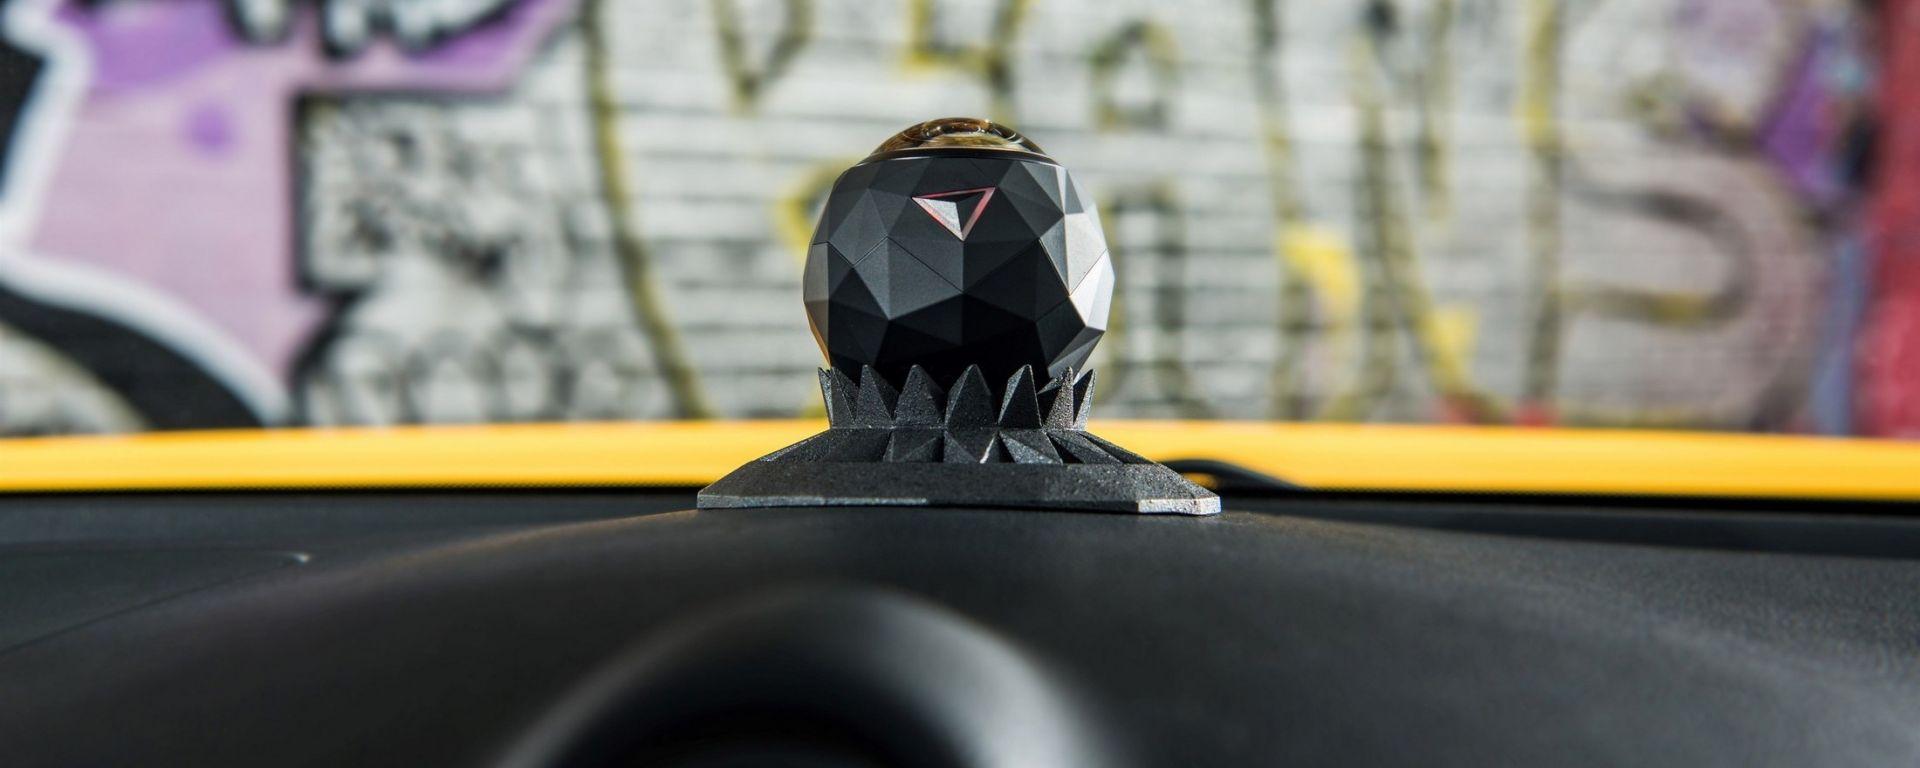 Nissan JukeCam: riprese a 360°